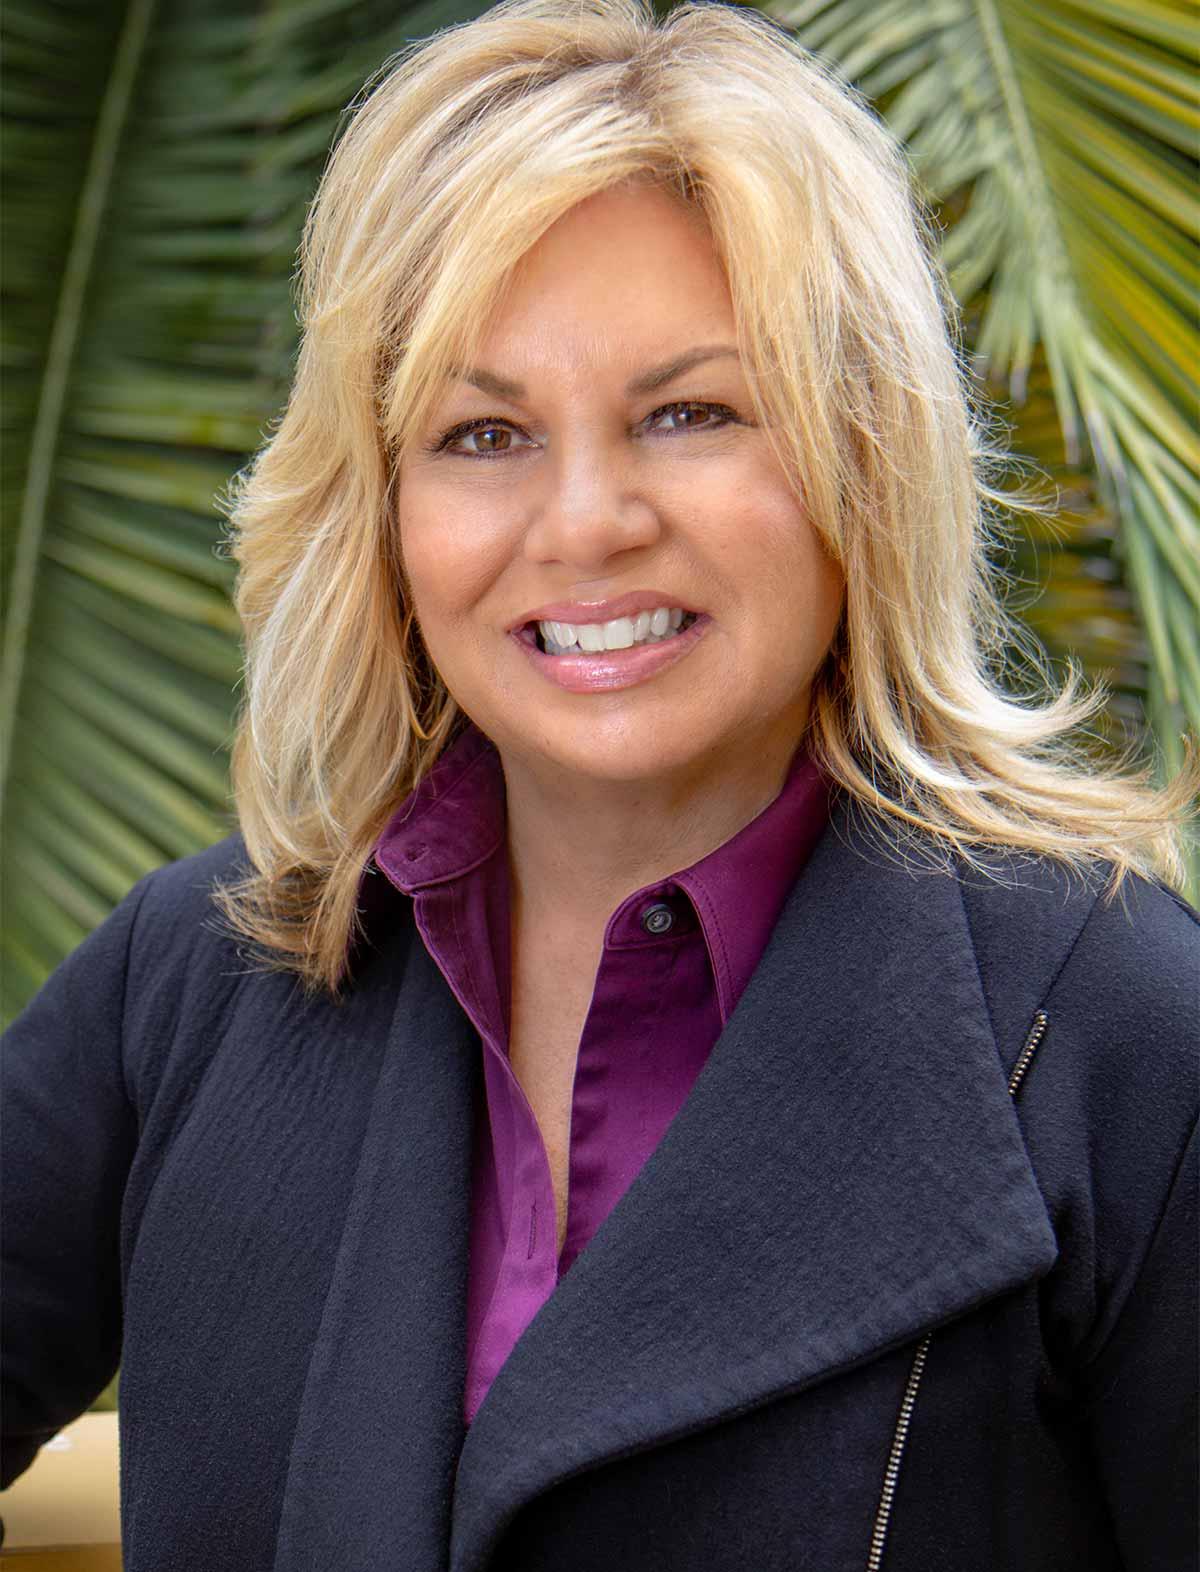 Susan Polk Insurance San Luis Obispo headshot Stacy